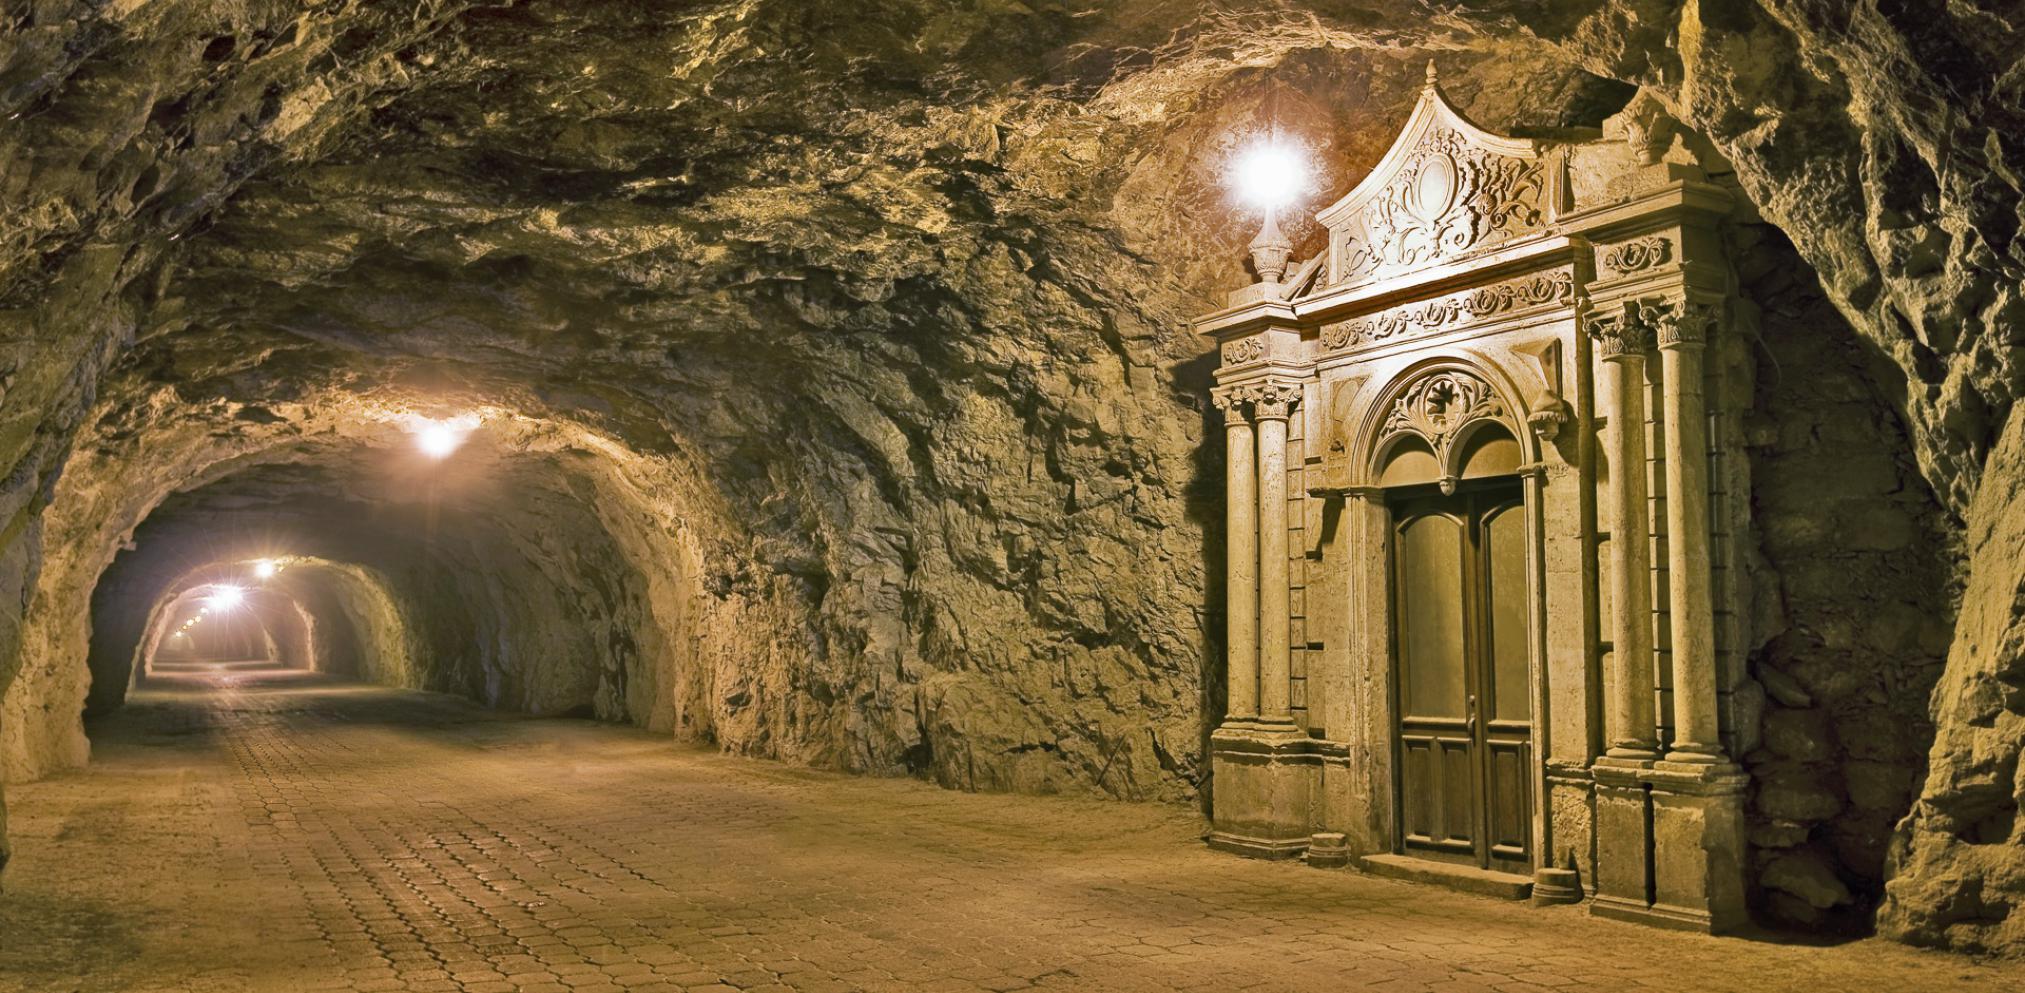 Tunel Ogarrio